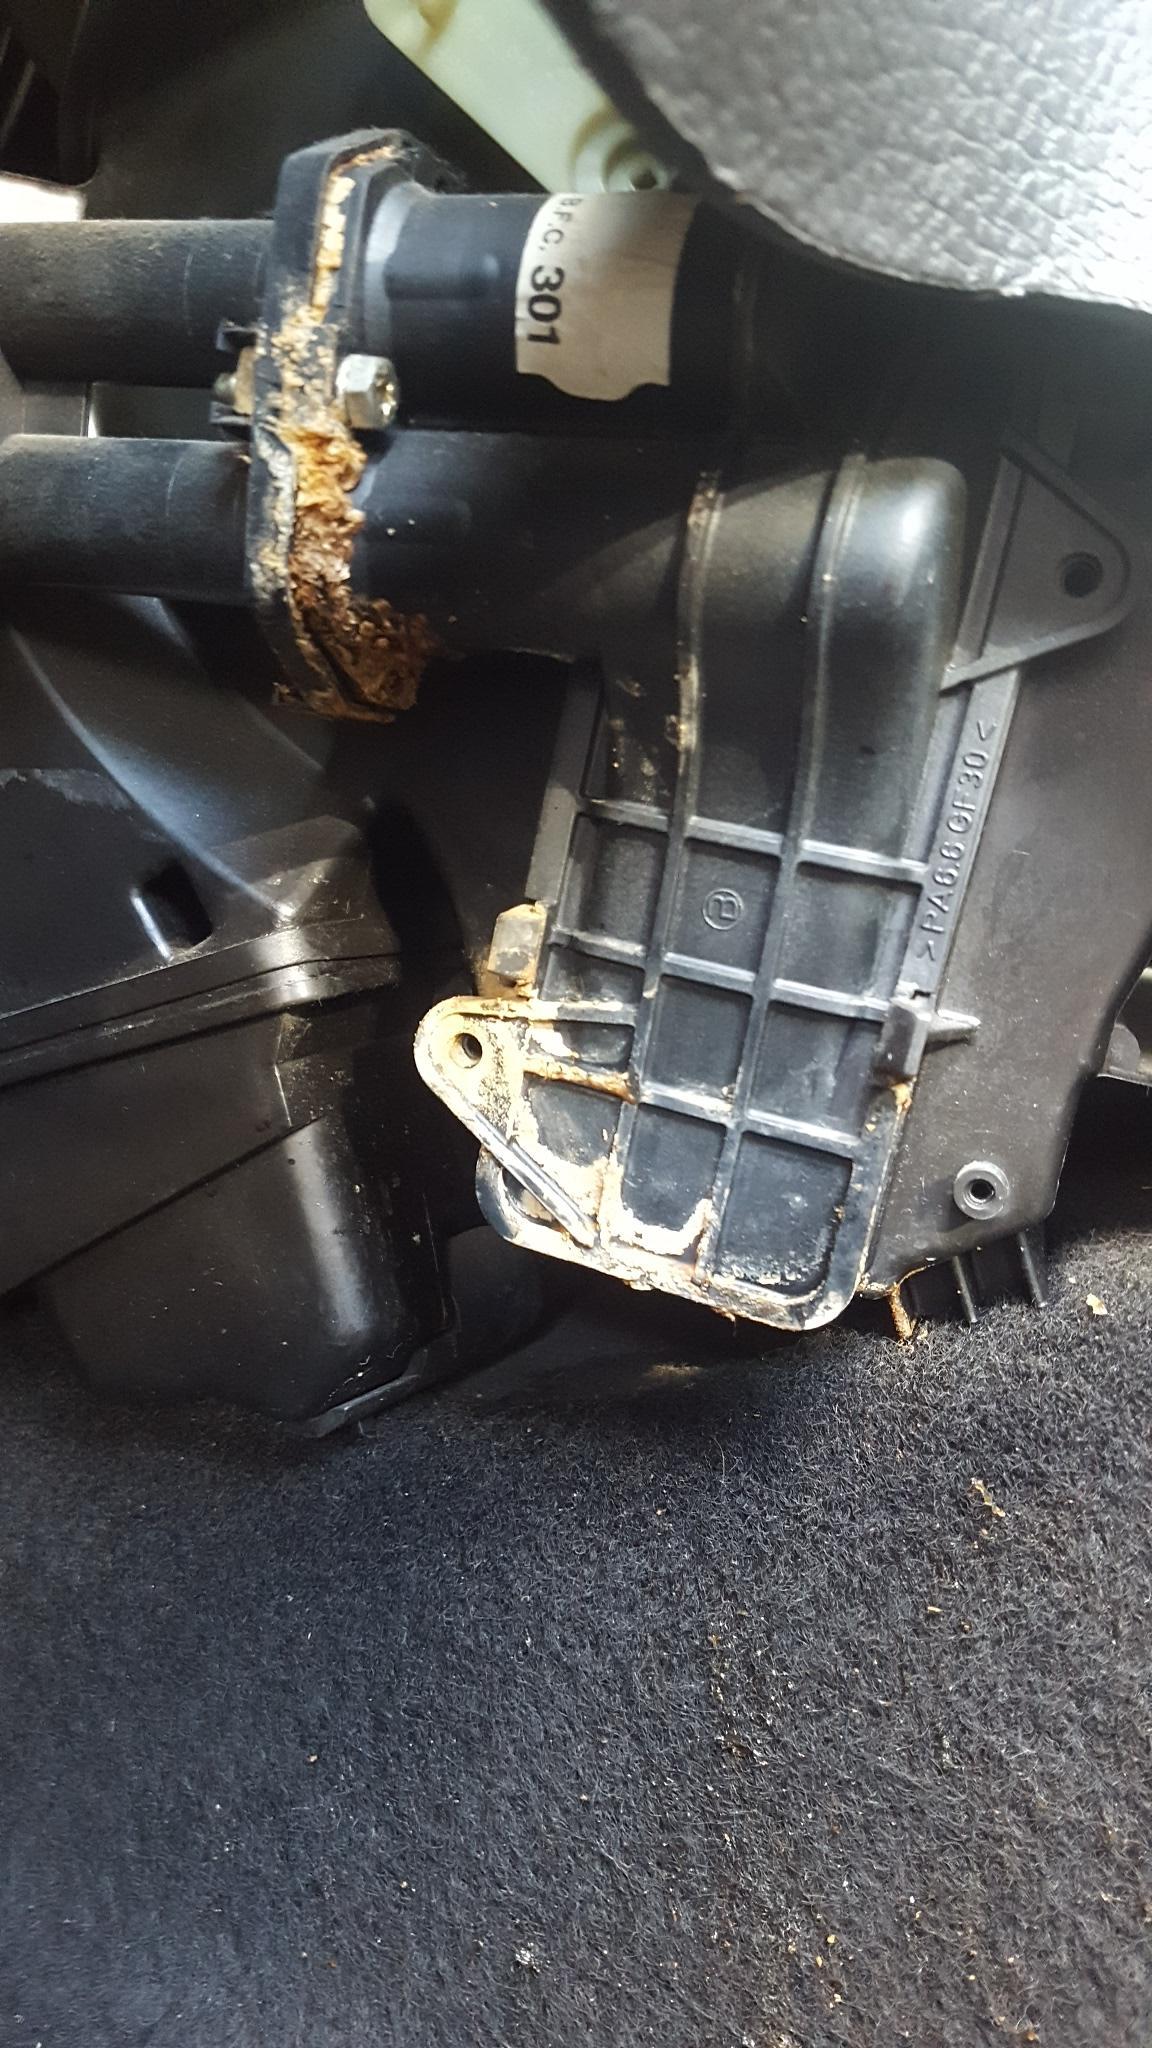 Peugeot 206 Suspected Heater Matrix Leak Motor Vehicle